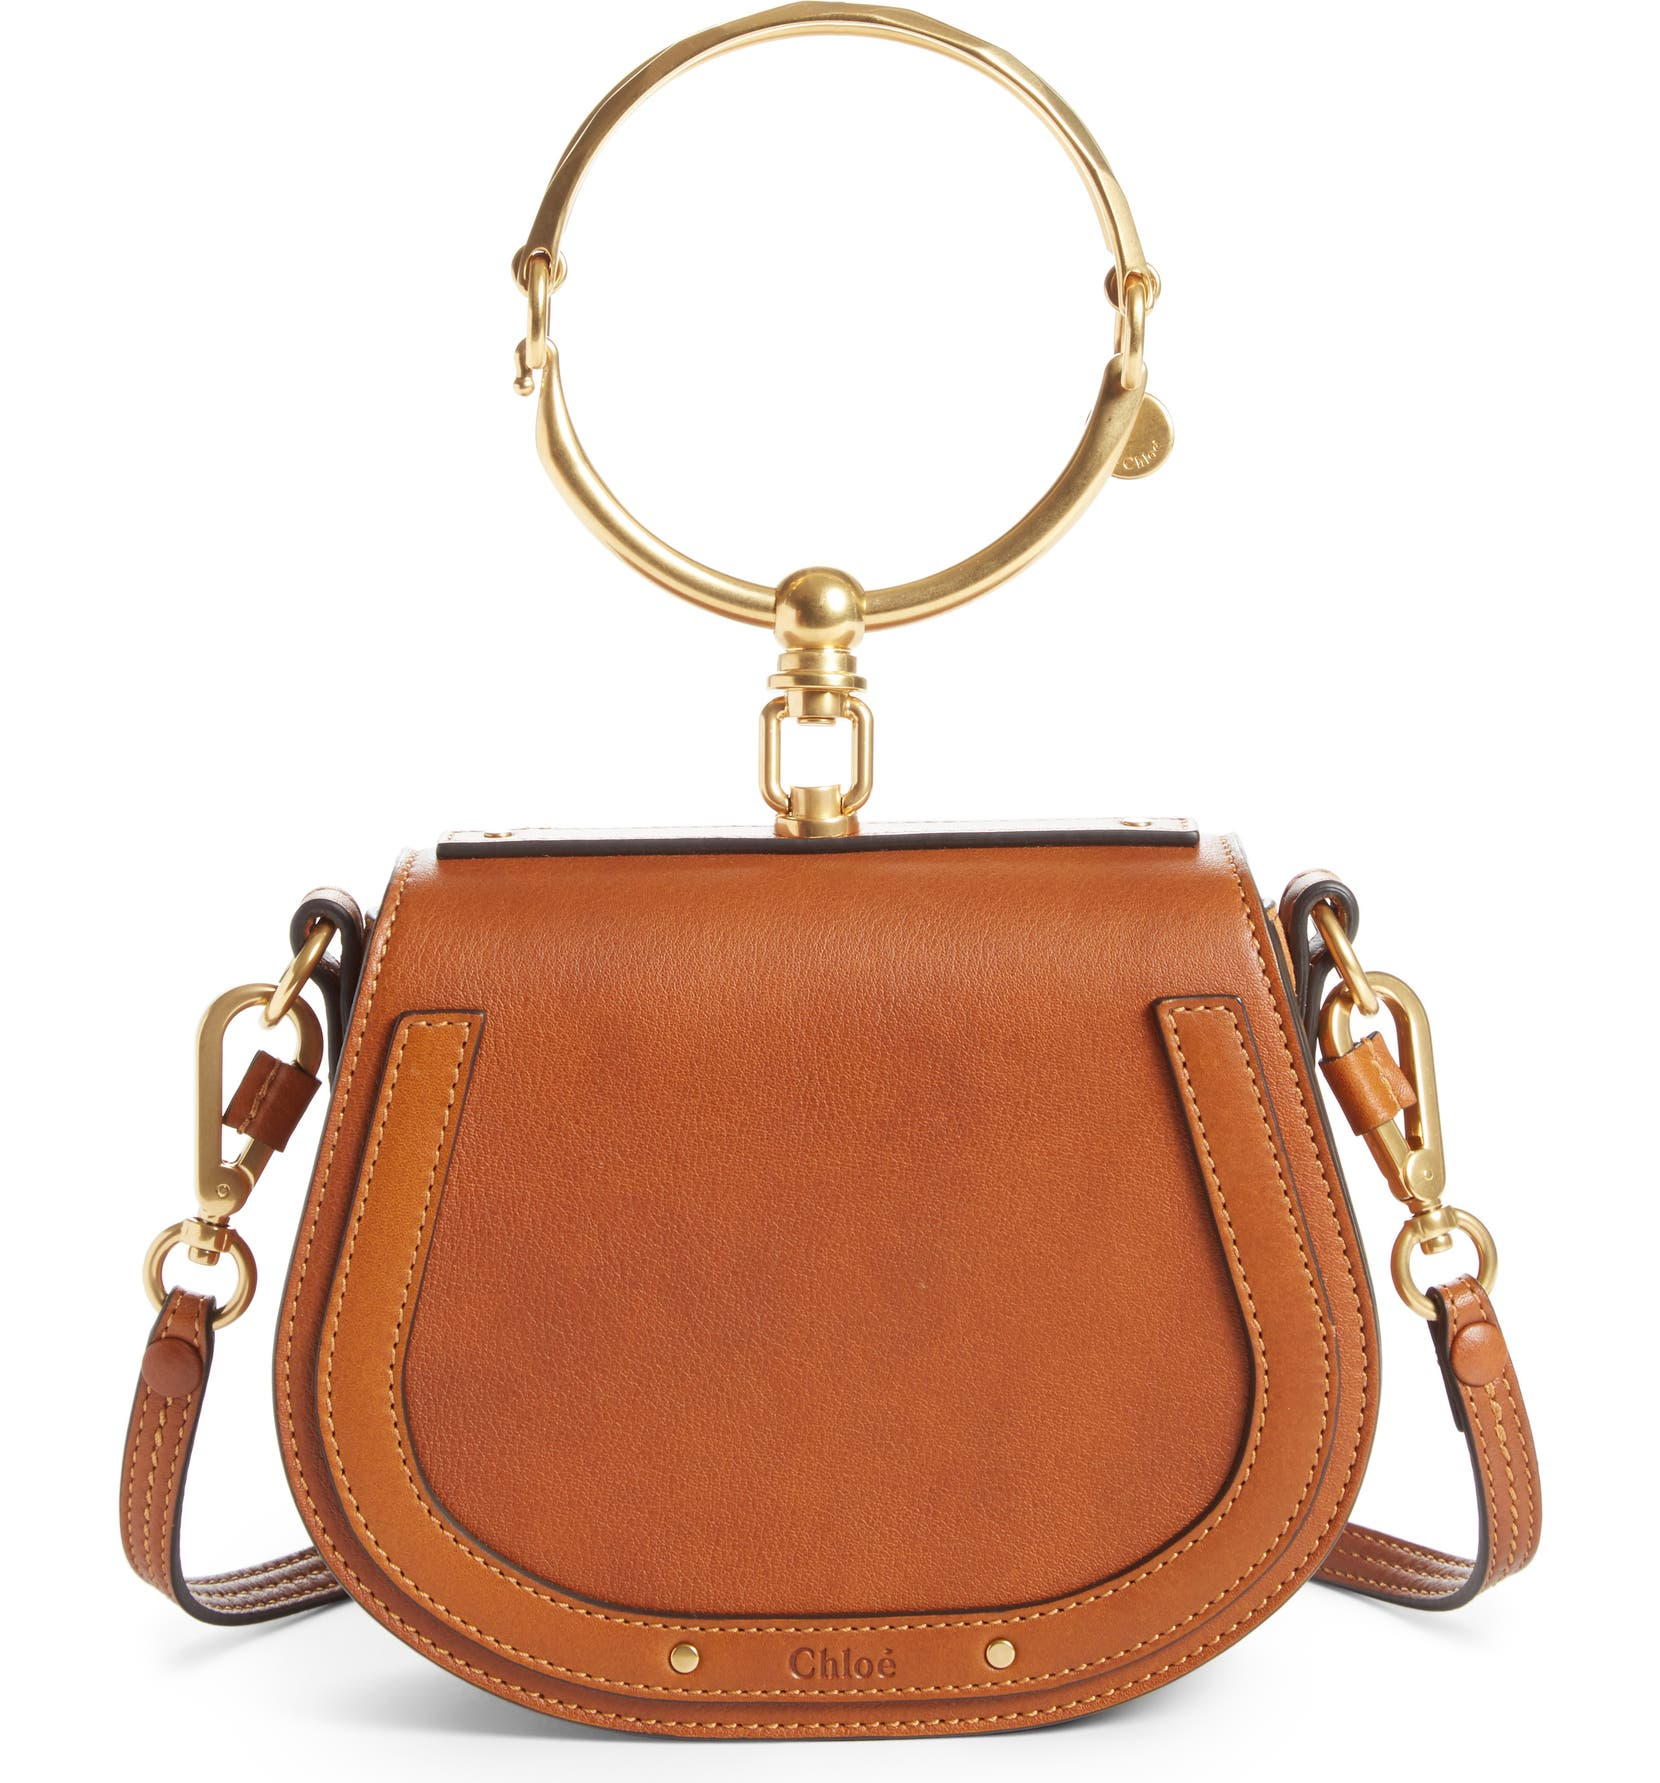 Chloé Small Nile Bracelet Leather Crossbody Bag  affc0cbbe6bc